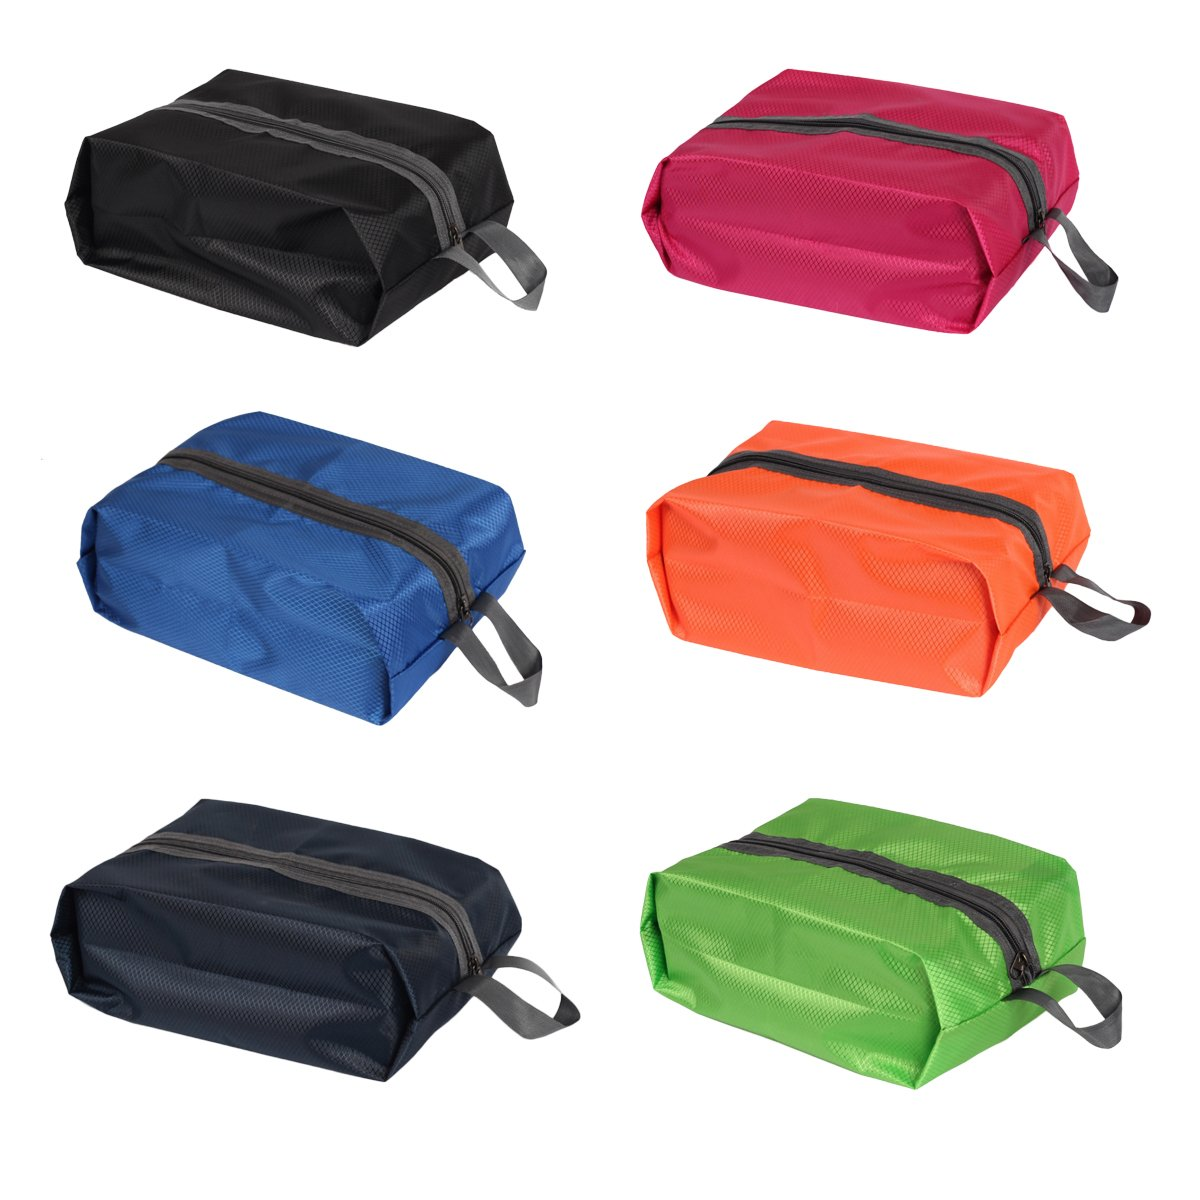 LaRosa Travel Shoe Bags Packing Cube Sliper Shoe Bags Bra Bag Underwear Bags Lingerie Bags T-shirt Bag 6 Colors